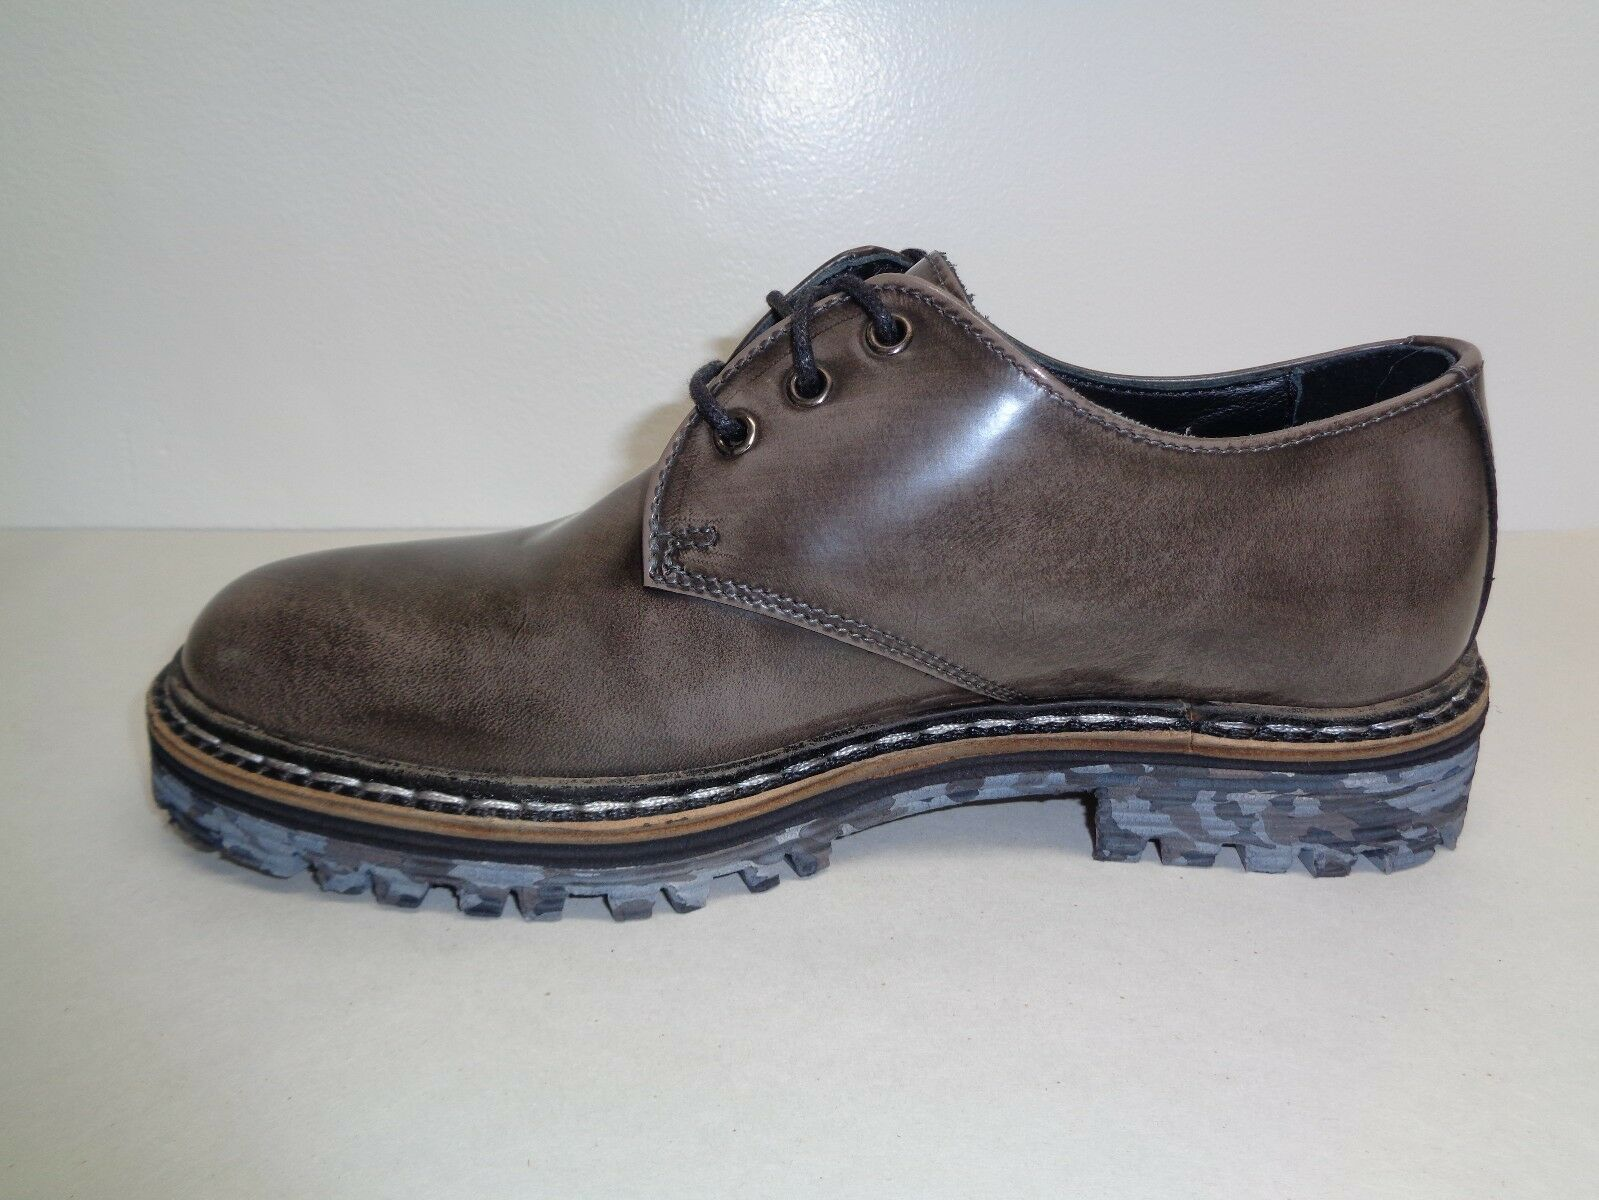 Catarina Martins Größe 7.5 to 8 PT9217 Oxfords Gray Leder Oxfords PT9217 New Damenschuhe Schuhes df5789